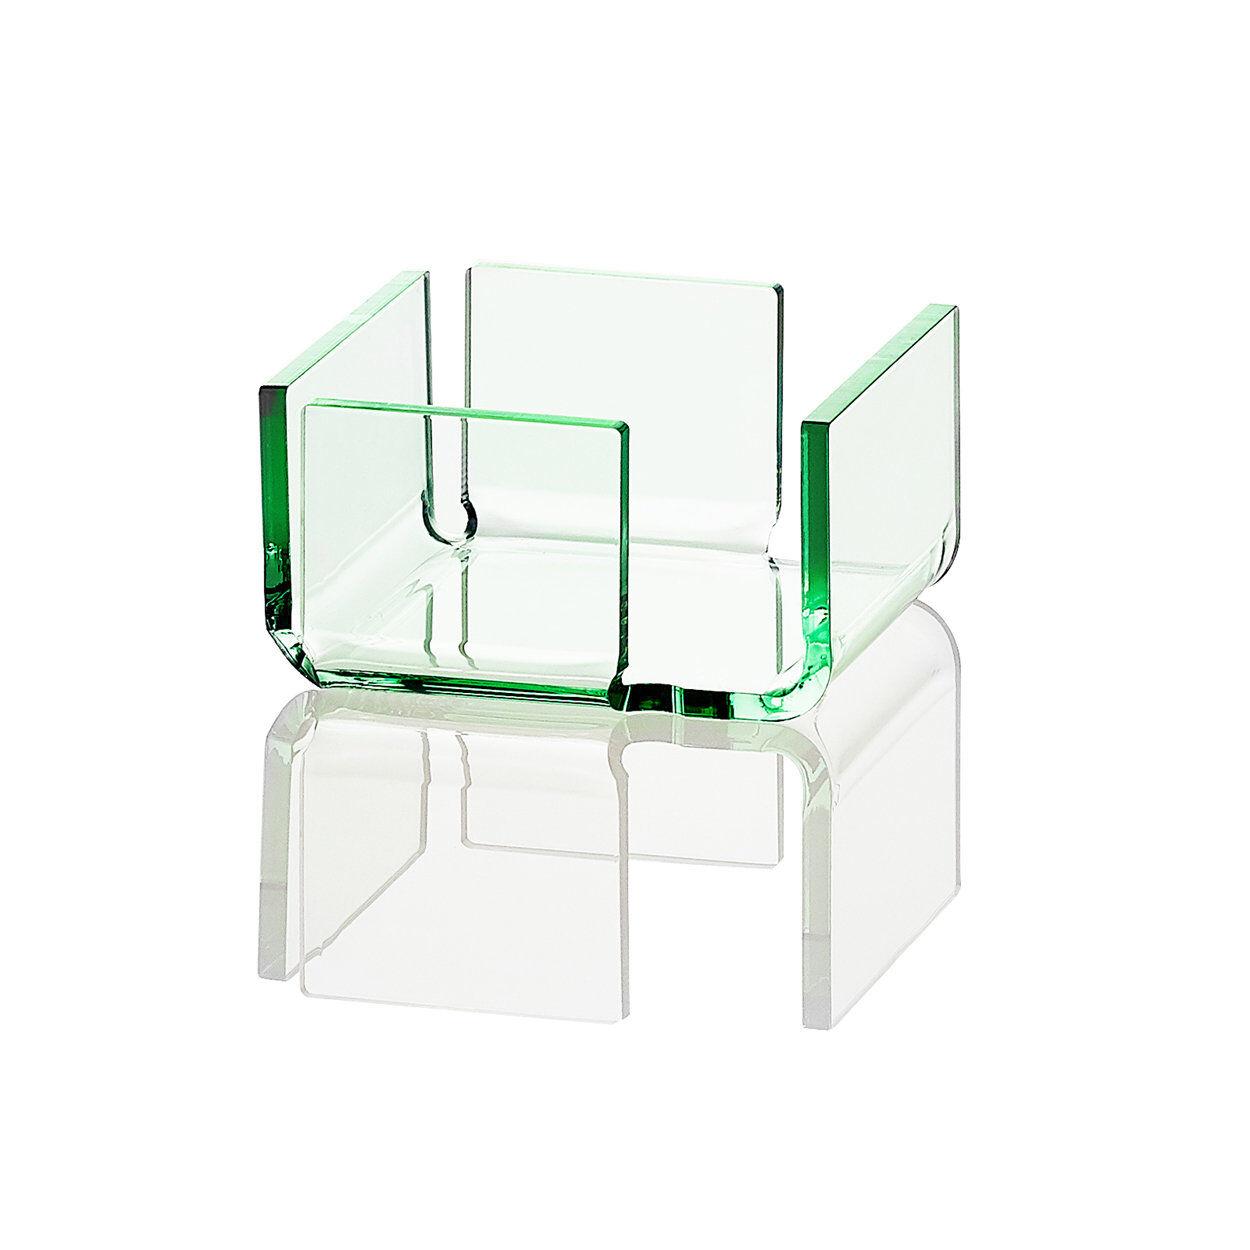 INOXRIV Flash verde 8 porta bustine zucchero / tovaglioli 10,4x9,9